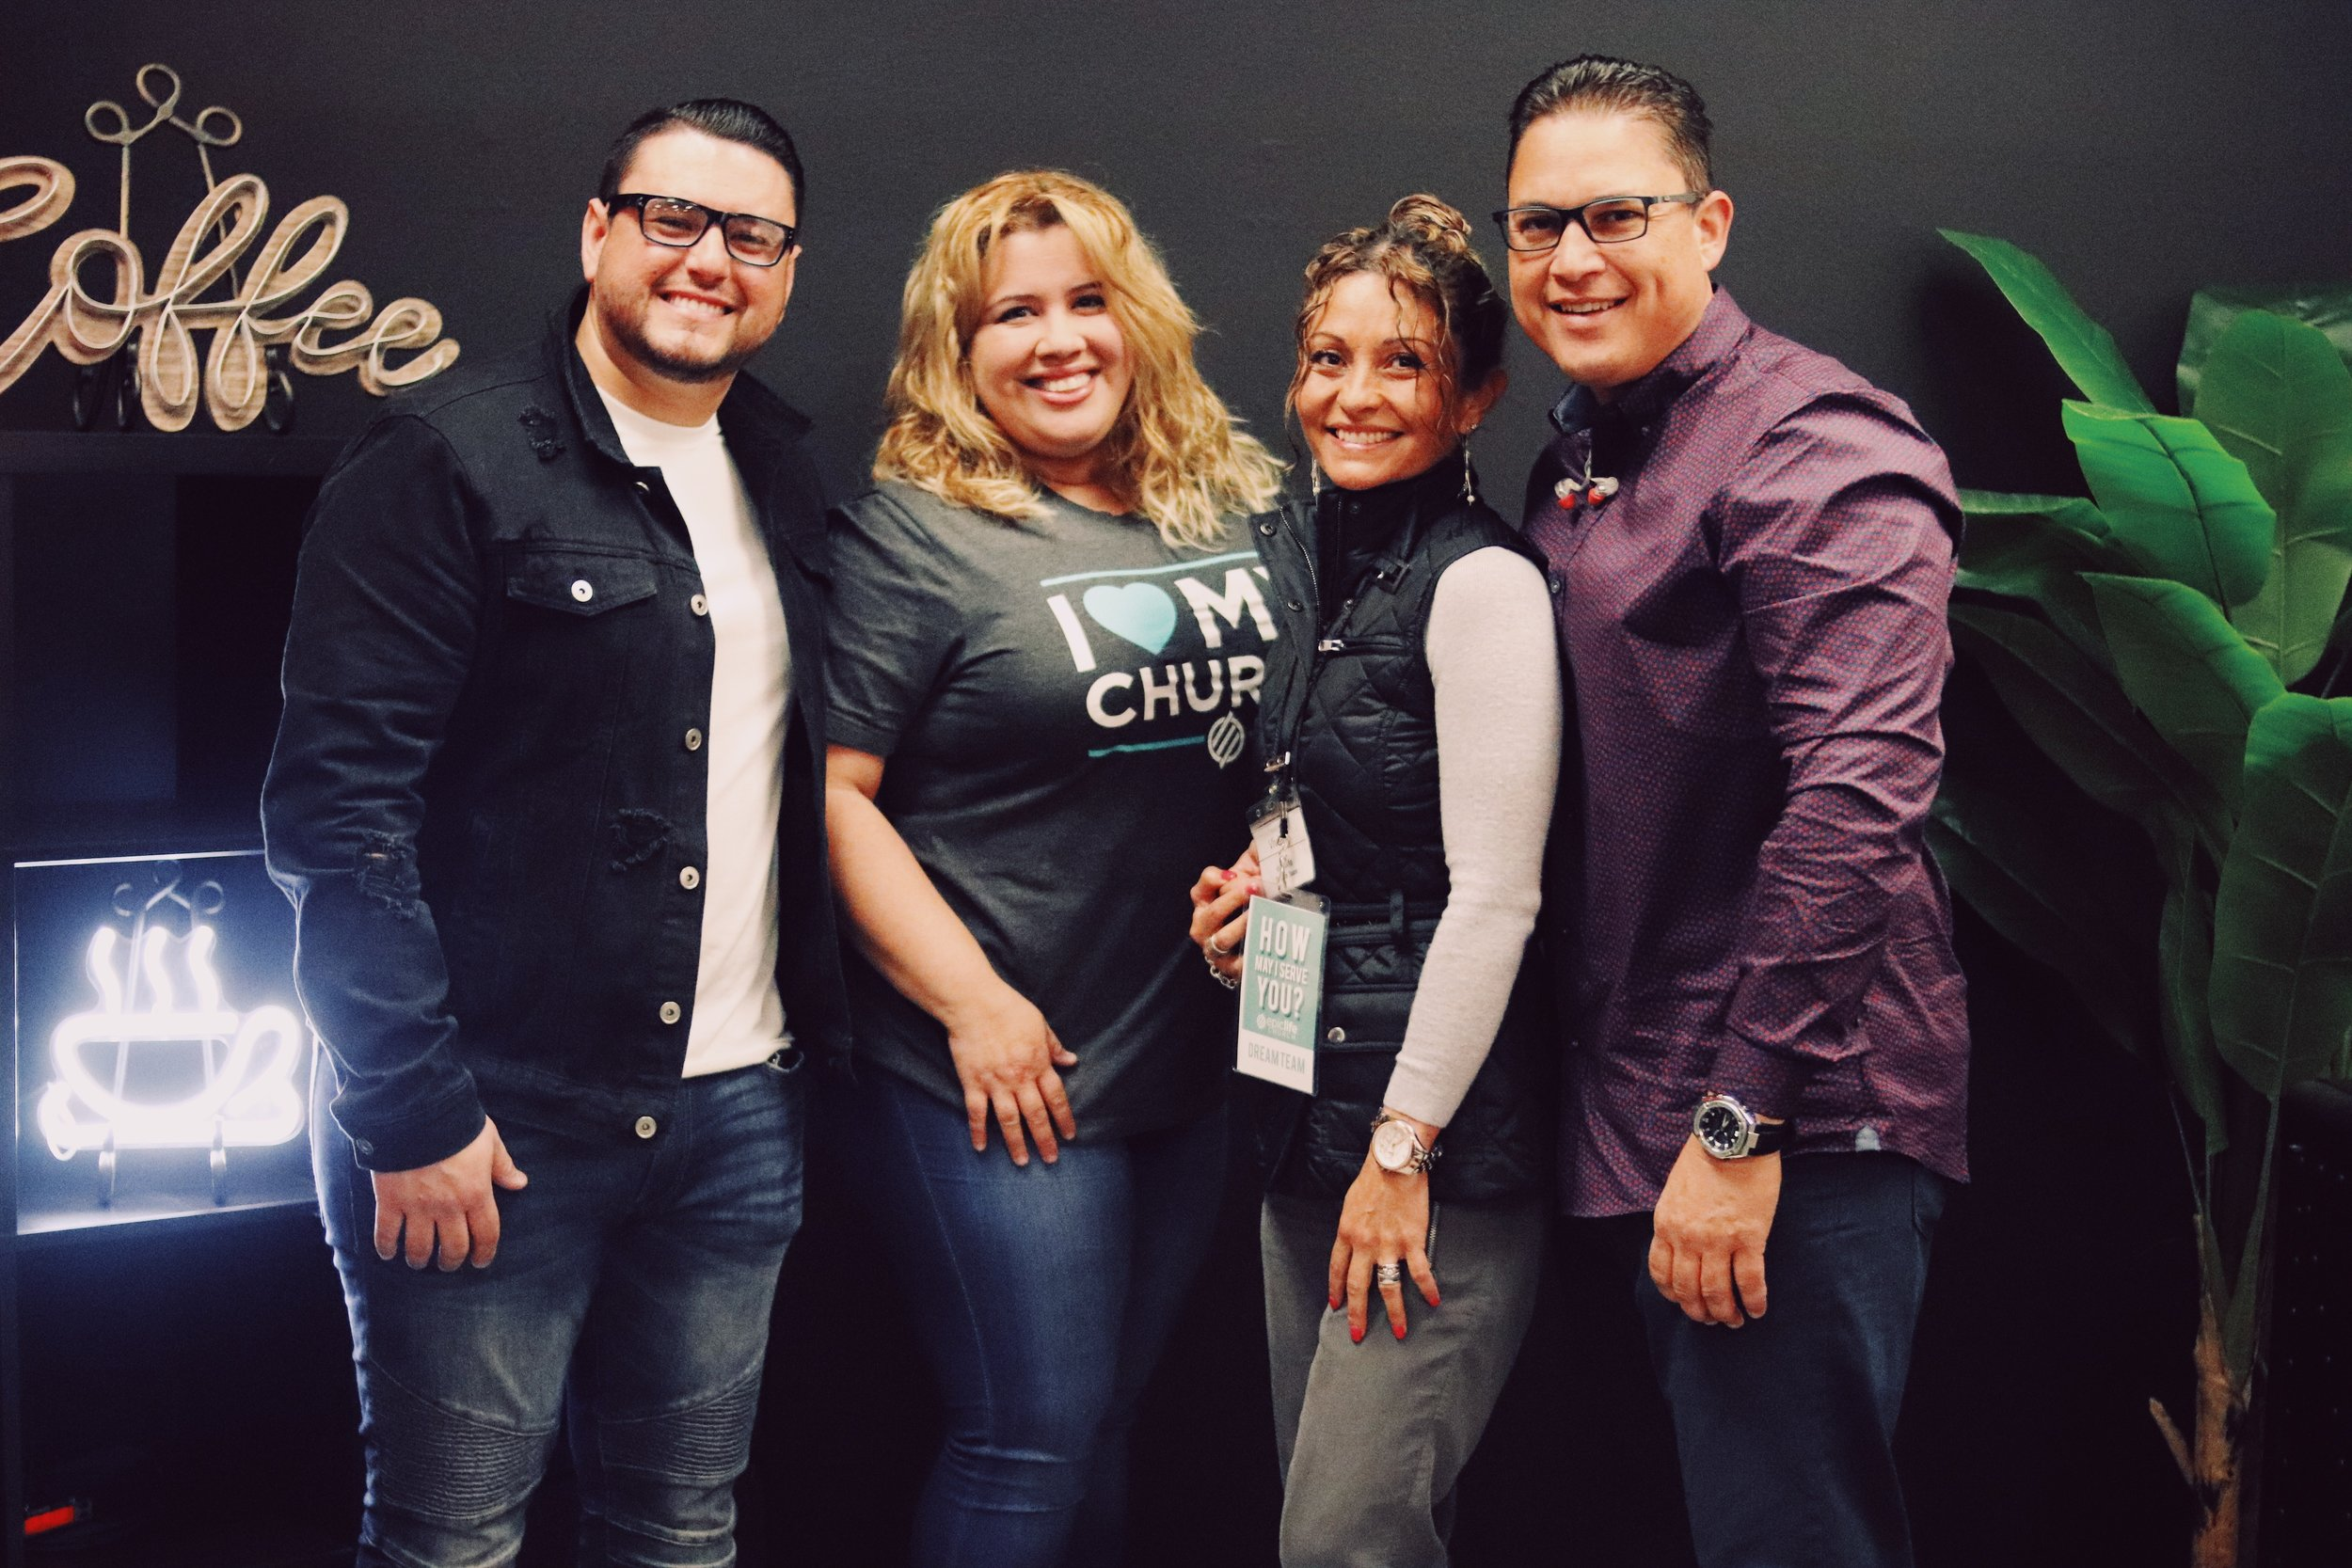 Connect Group Español - Saturday's at 7:00 pm - Lake NonaOscar Negron, Viviana Garzon, Ruben & Vanessa Gil